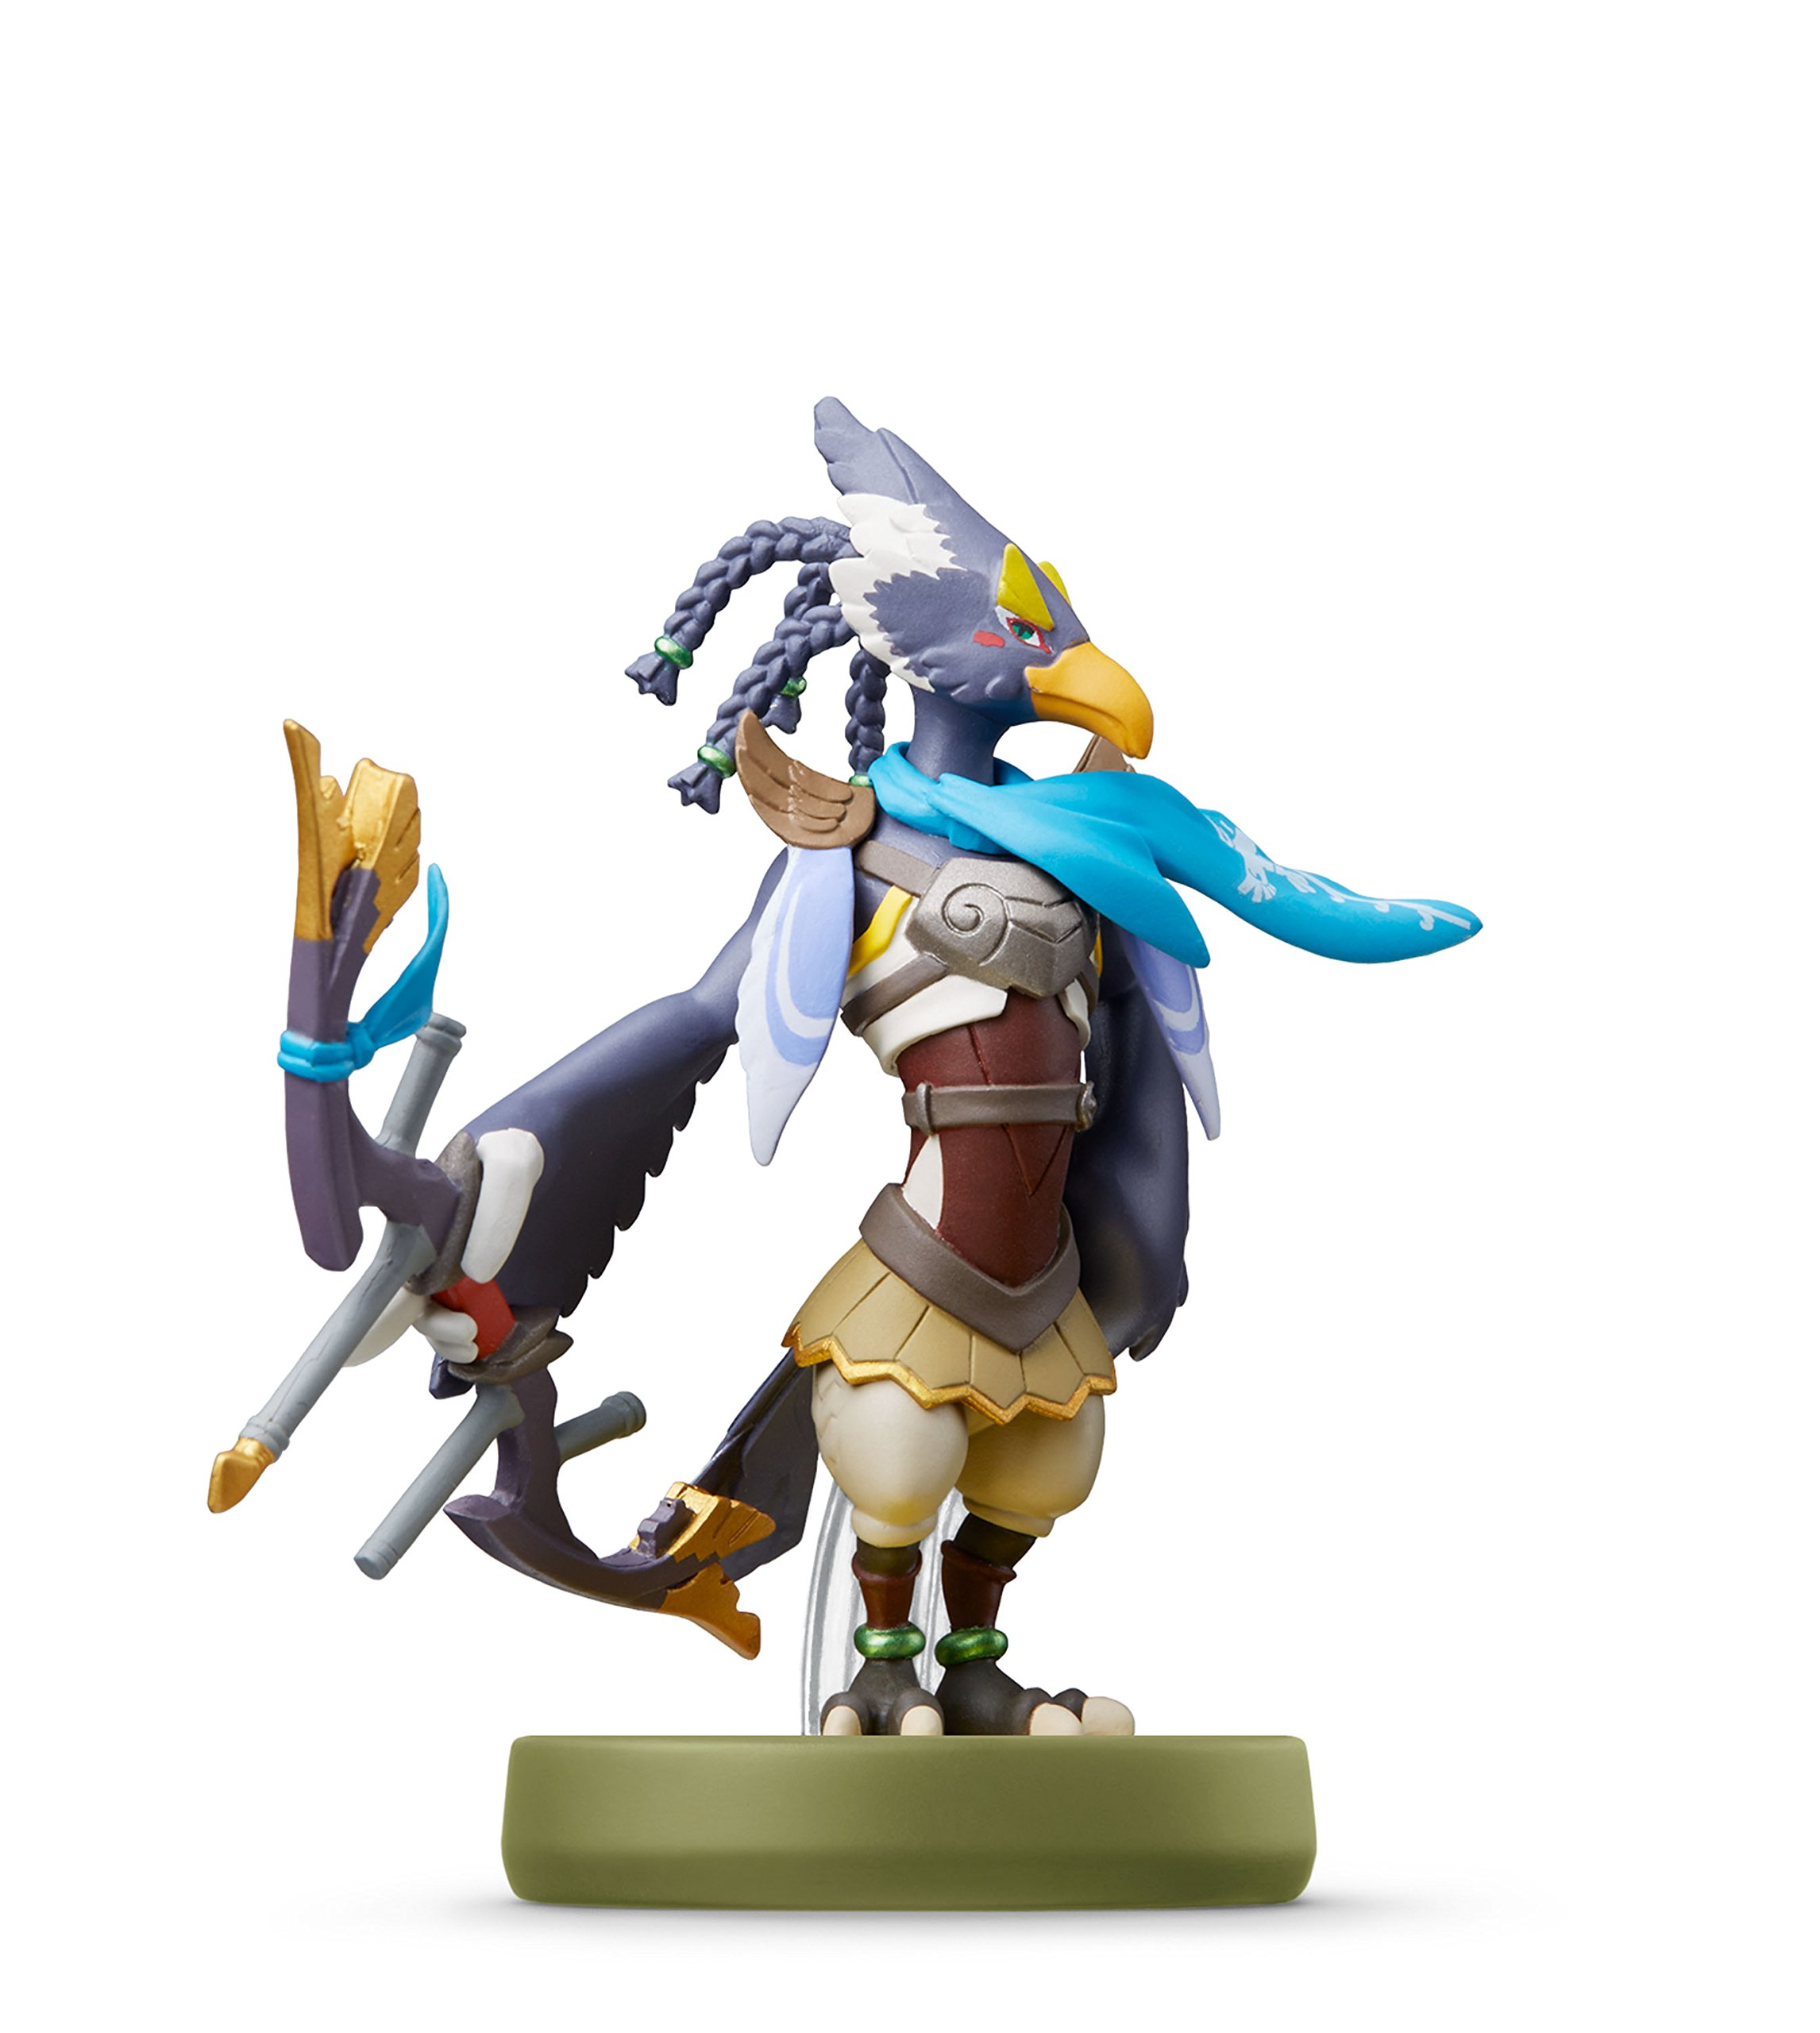 Nintendo Zelda Breath of the Wild - 4 Champions Amiibo Set by Nintendo (Image #6)